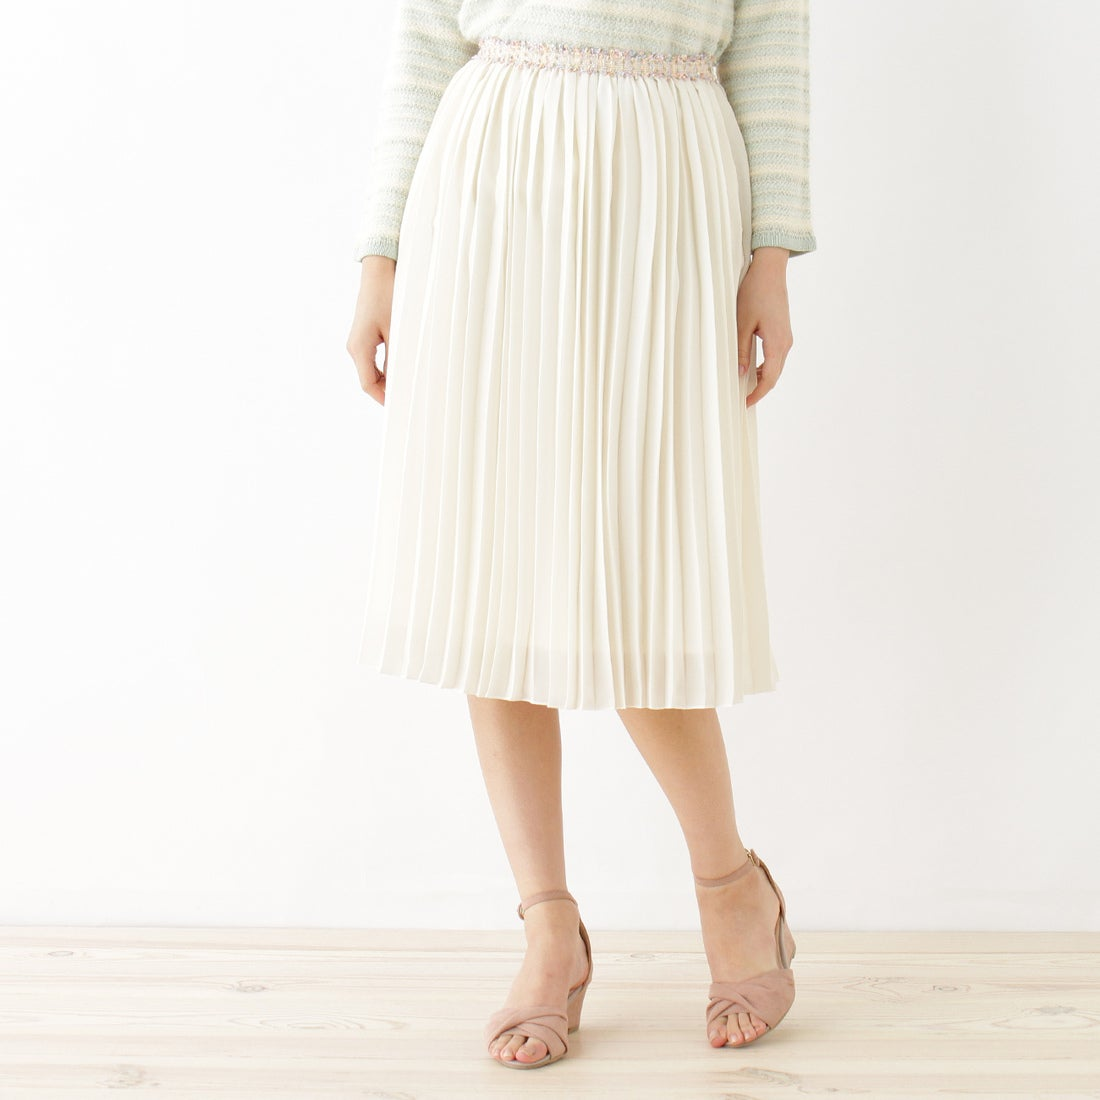 【SALE 73%OFF】クチュール ブローチ Couture brooch 【WEB限定プライス】デザインベルトプリーツスカート (オフホワイト)